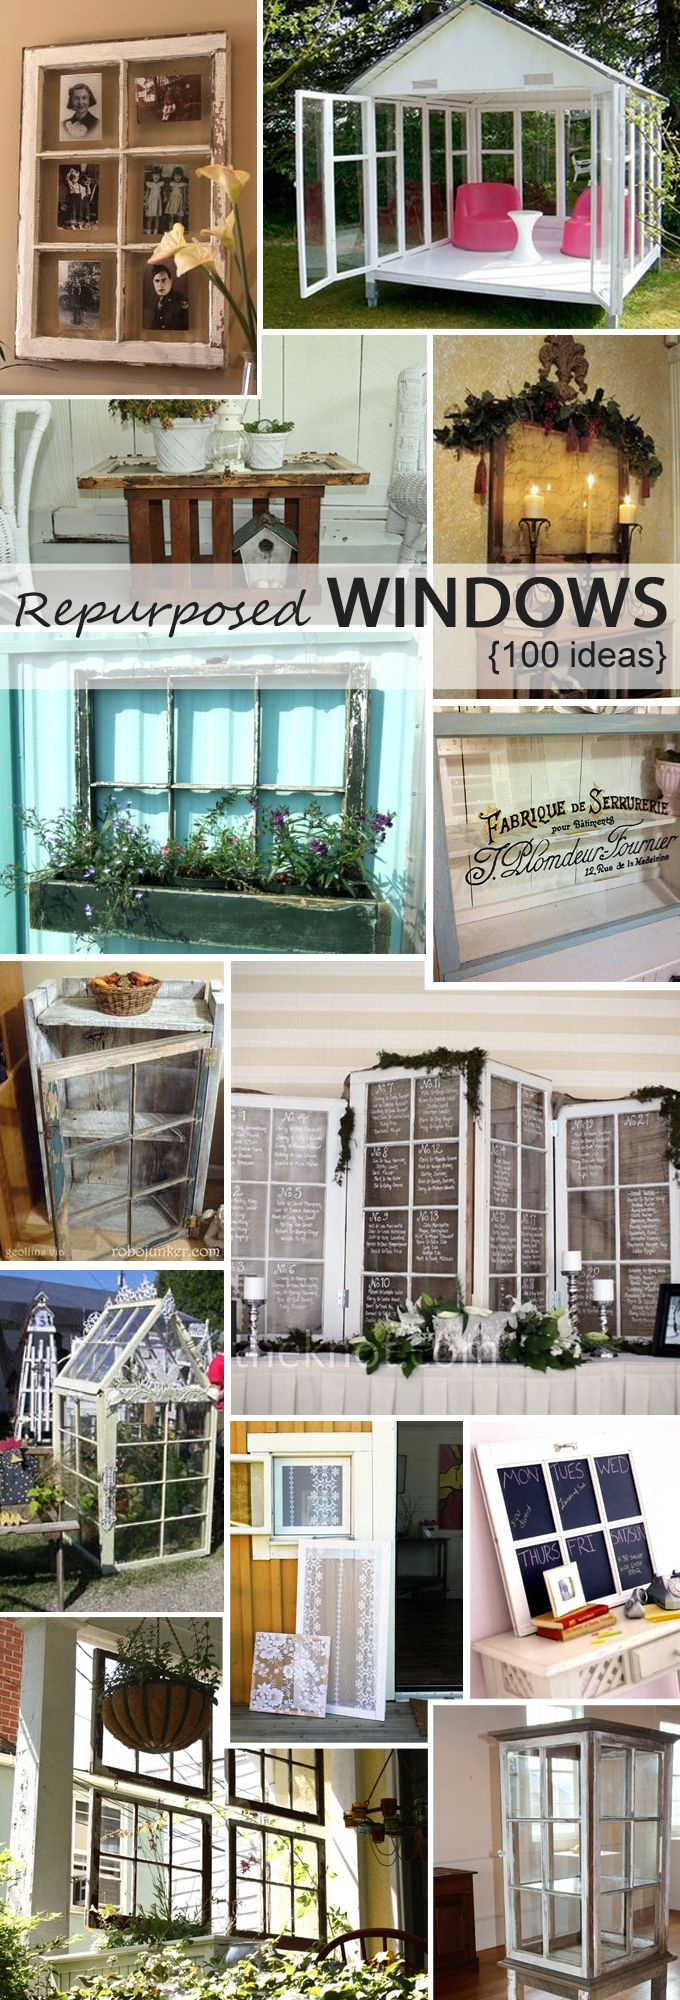 Recycled and Repurposed Window DIY     http://recreatedesigncompany.com/repurposed-windows/